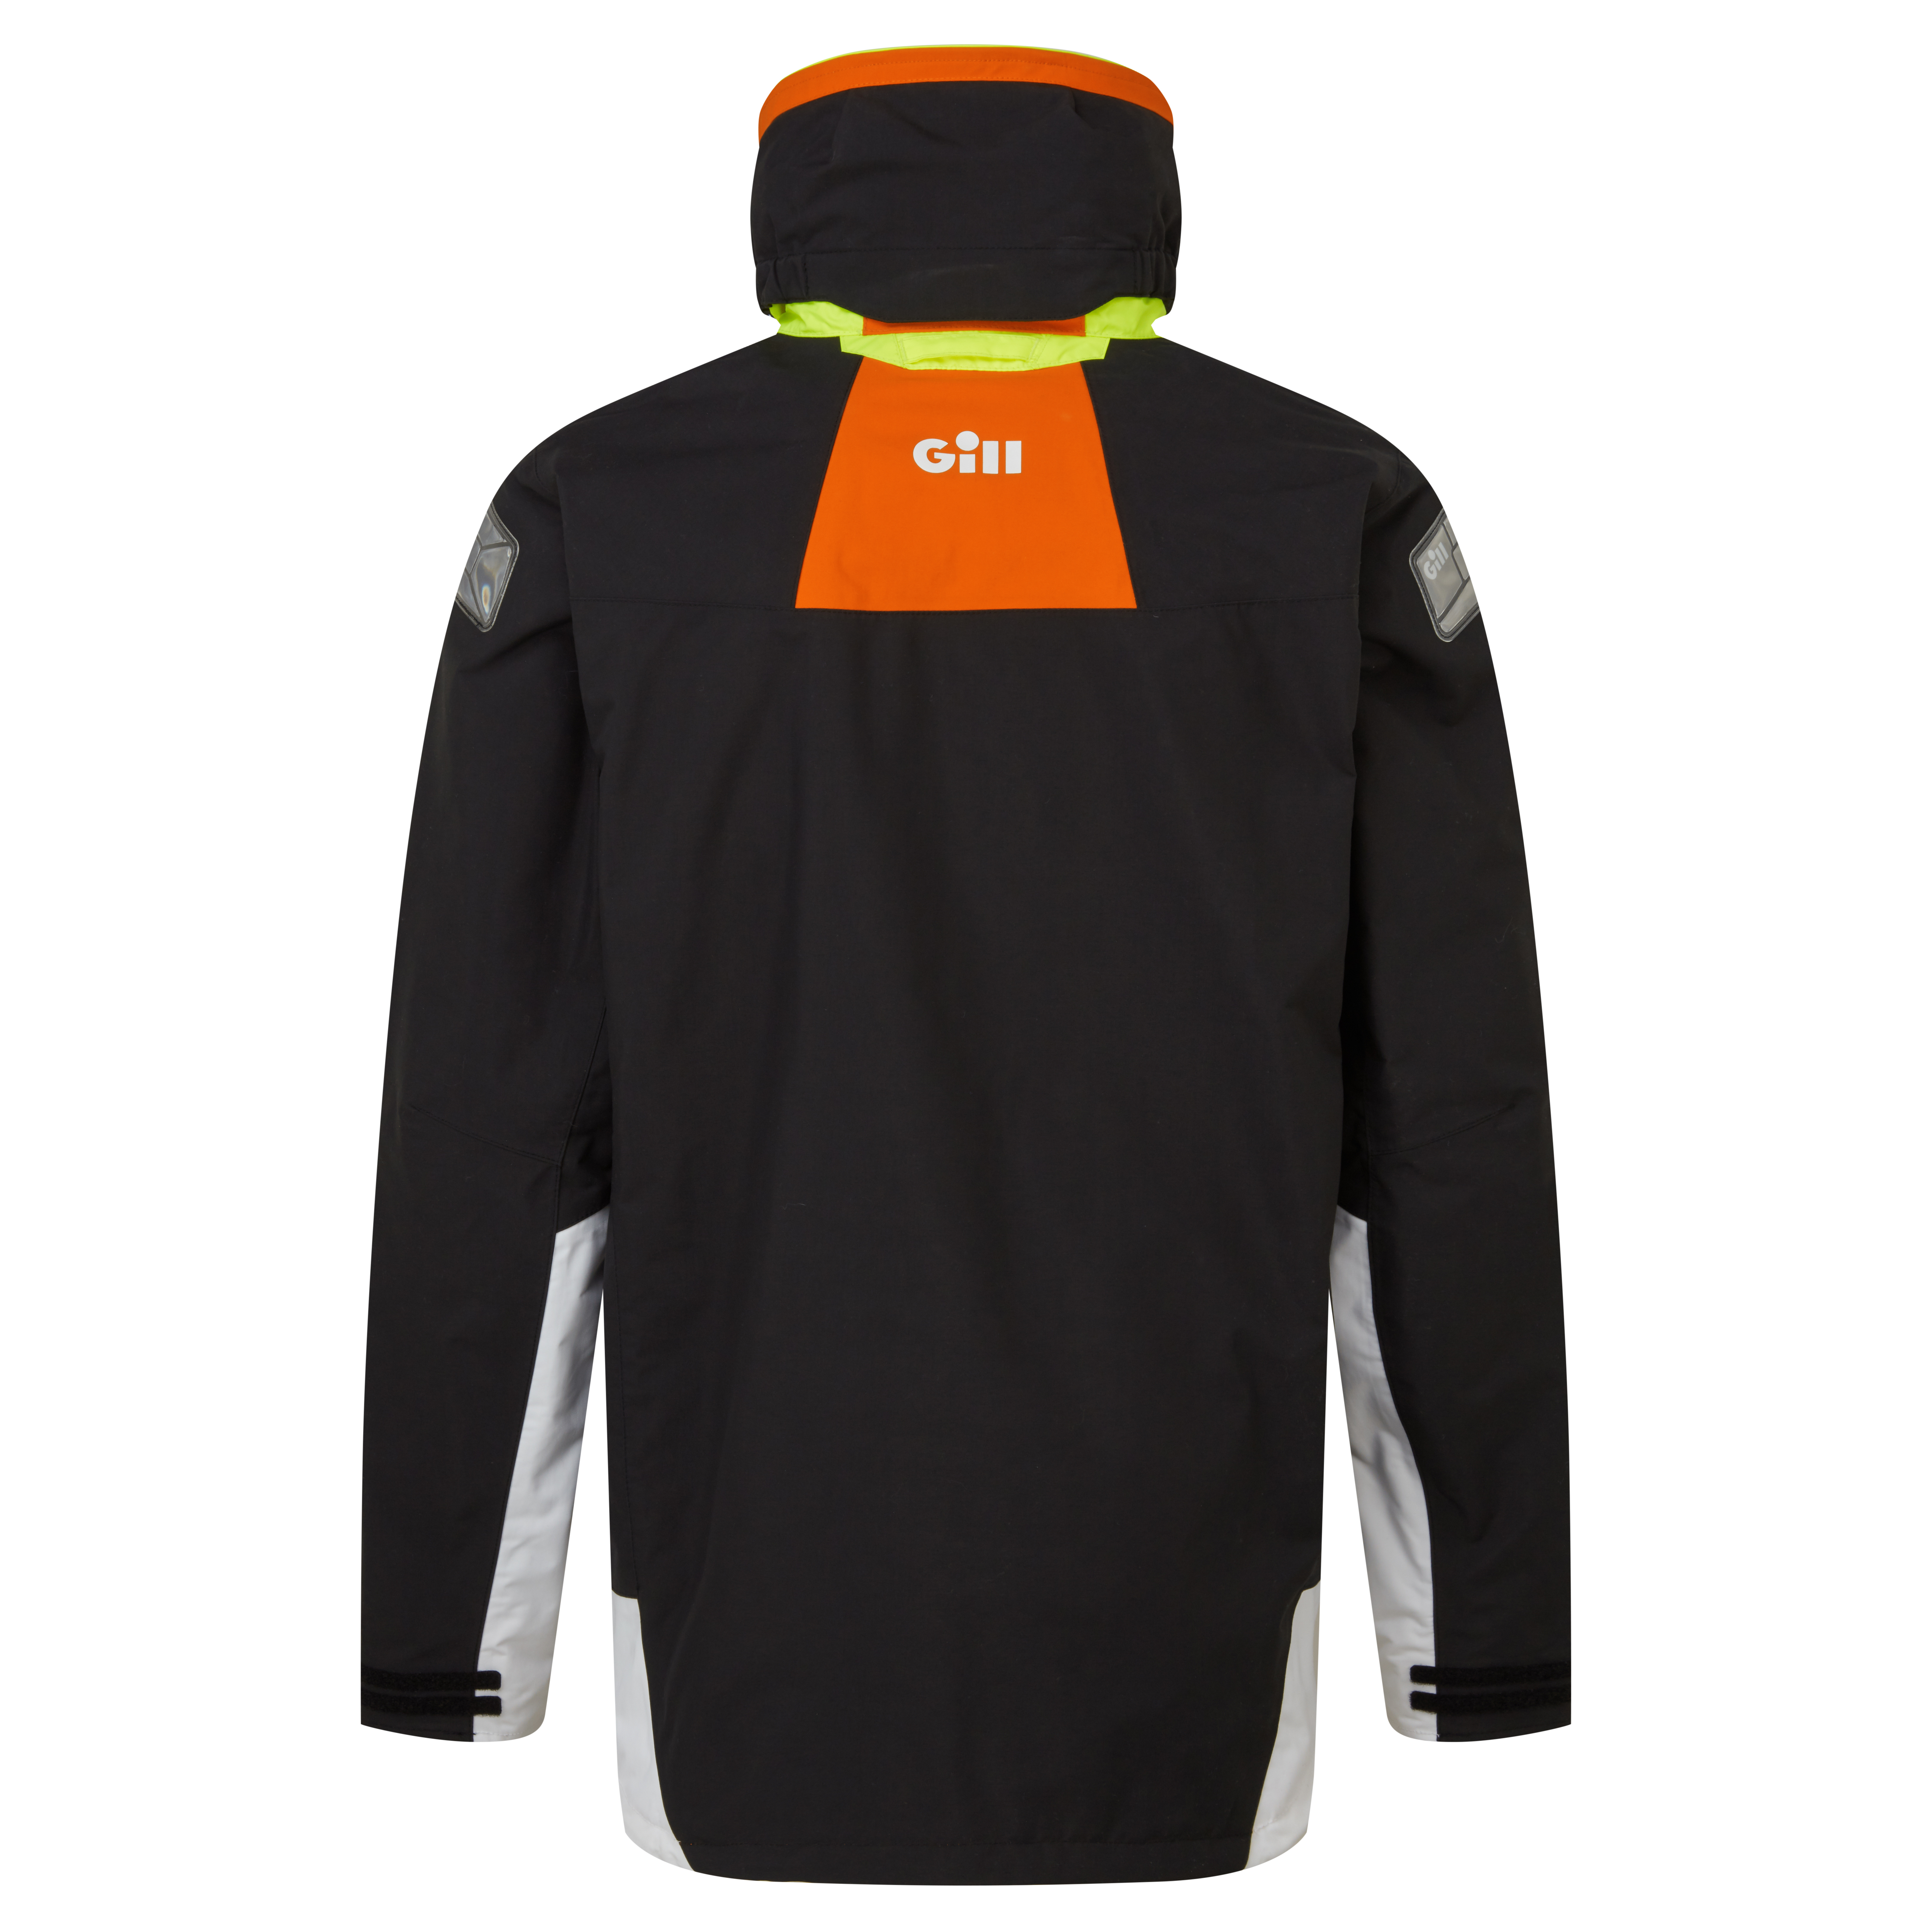 OS2 Offshore Men's Jacket - OS24J-BLKLTD_4.jpg